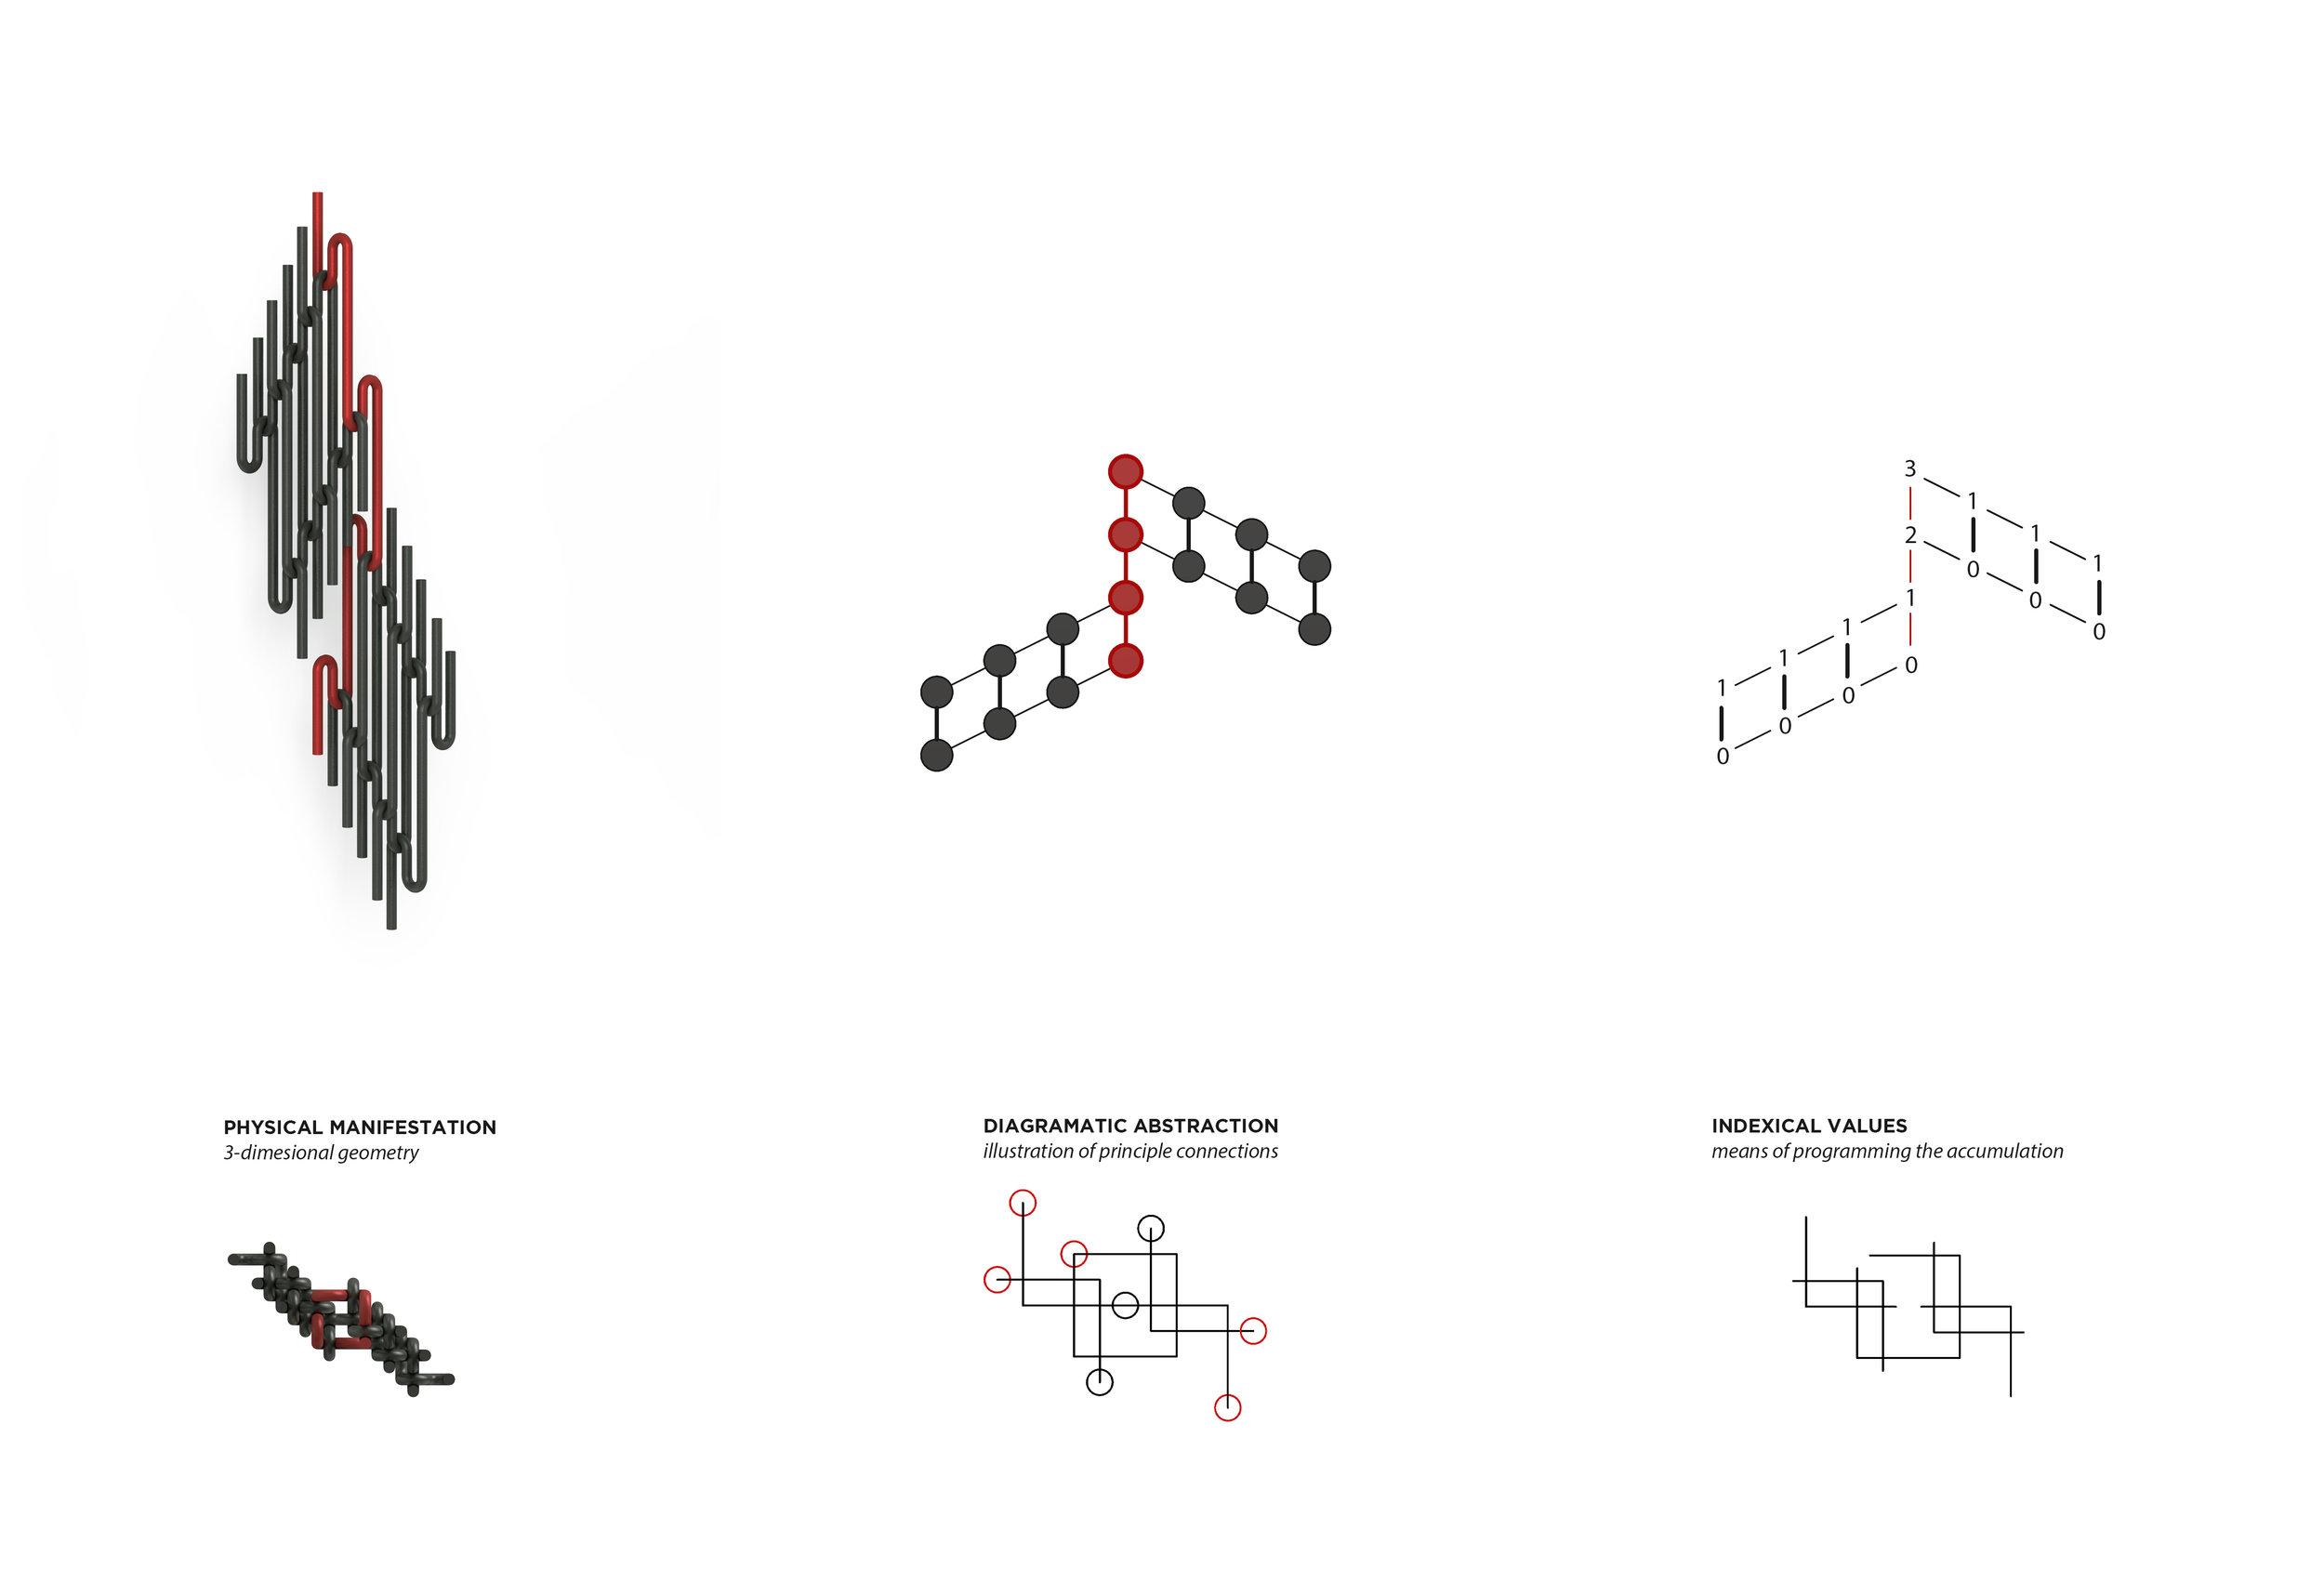 Unit 19_Mayer_Elliot_computational abstraction.jpg